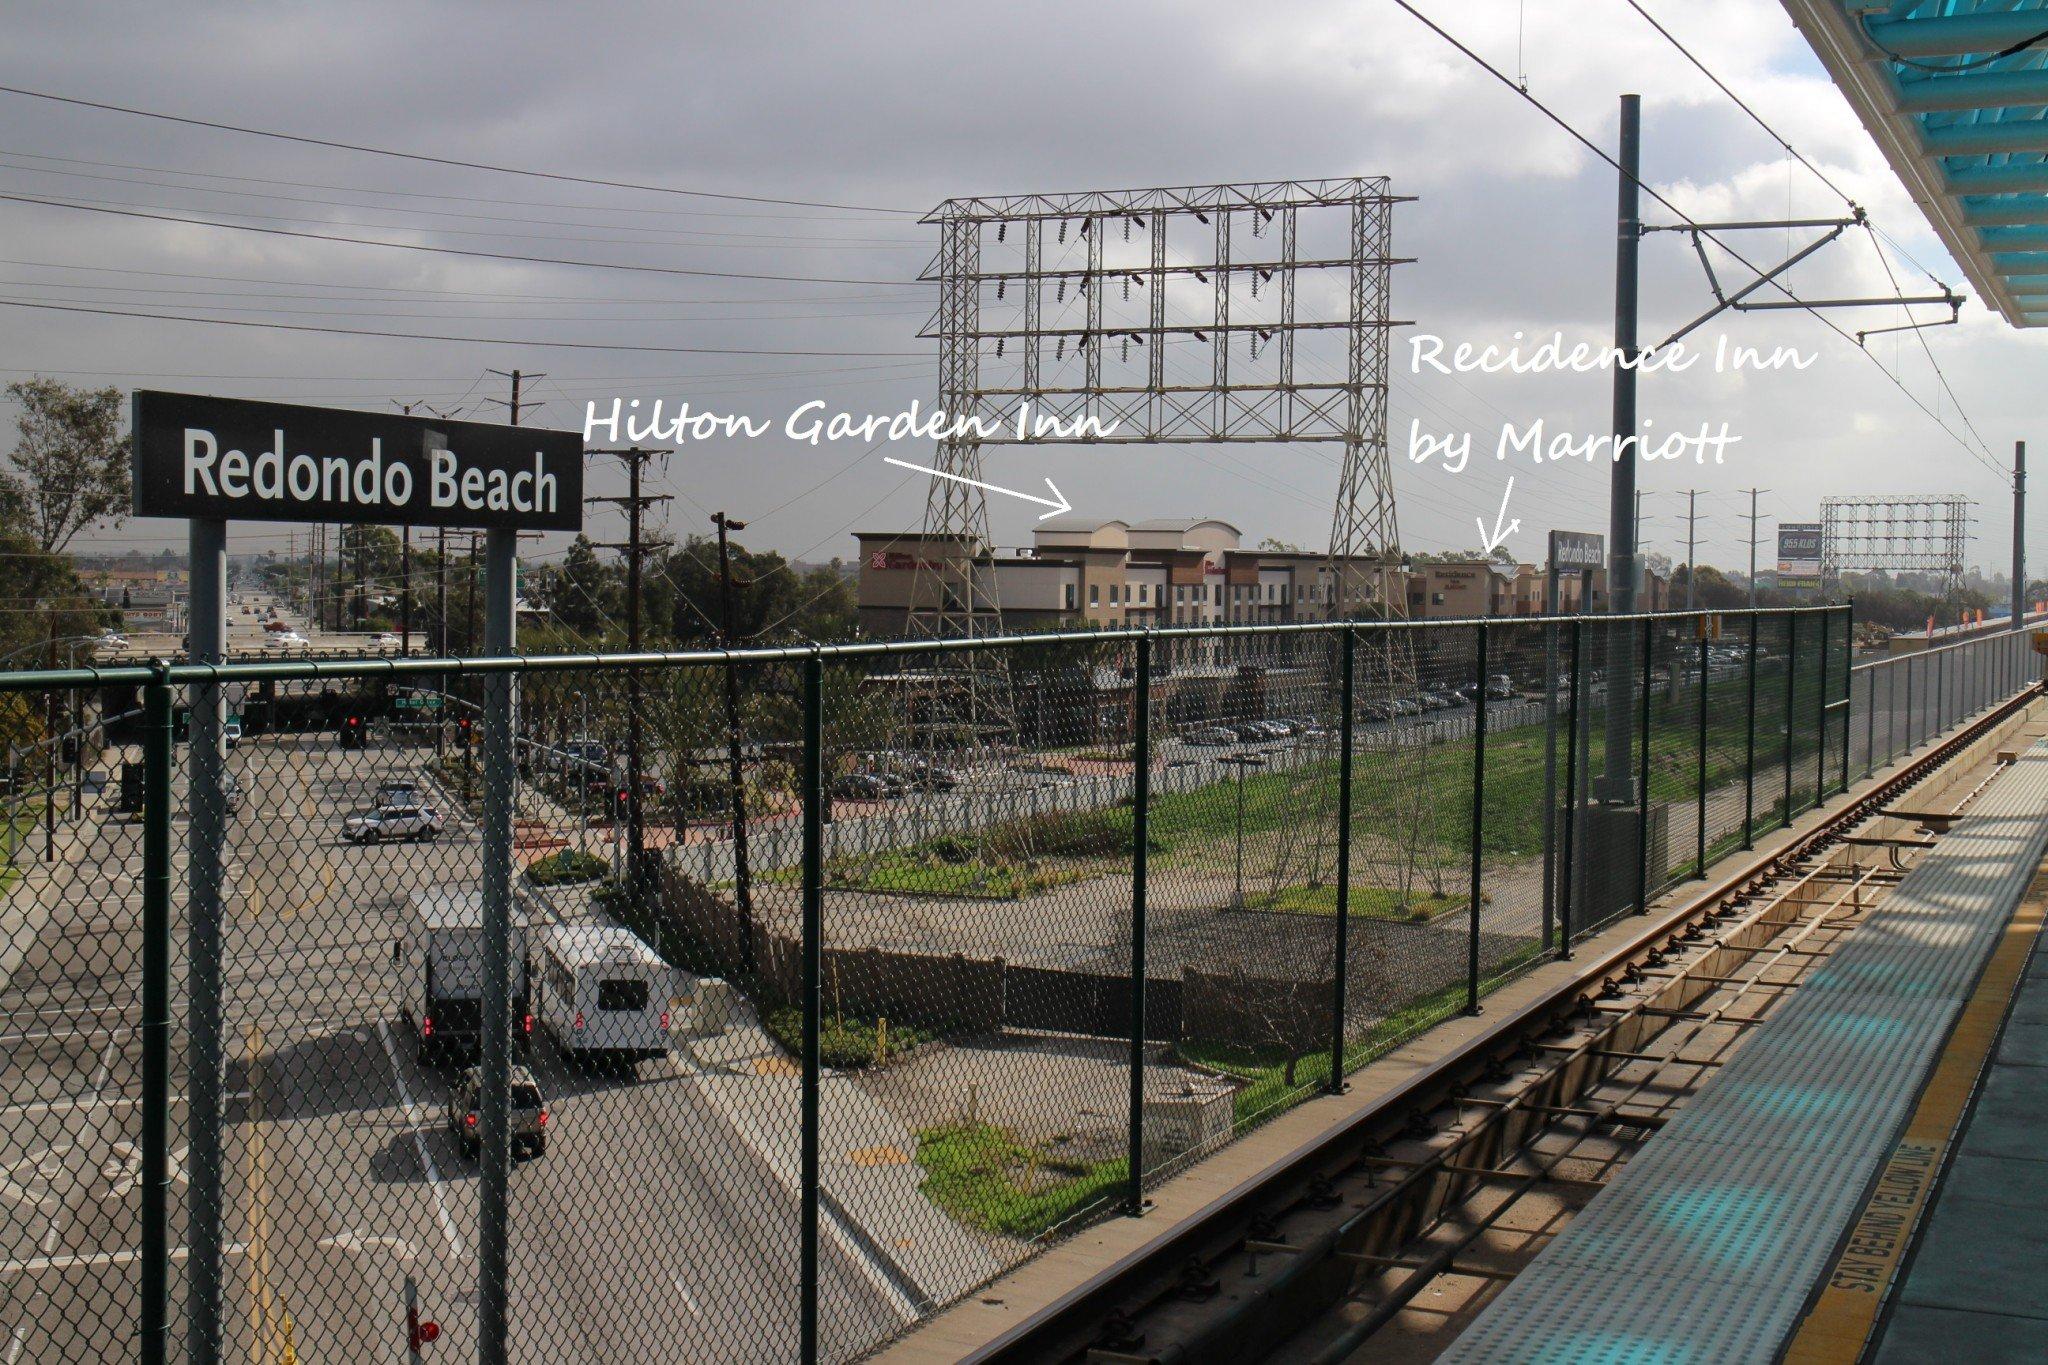 Recidence Inn Redondo Beach location